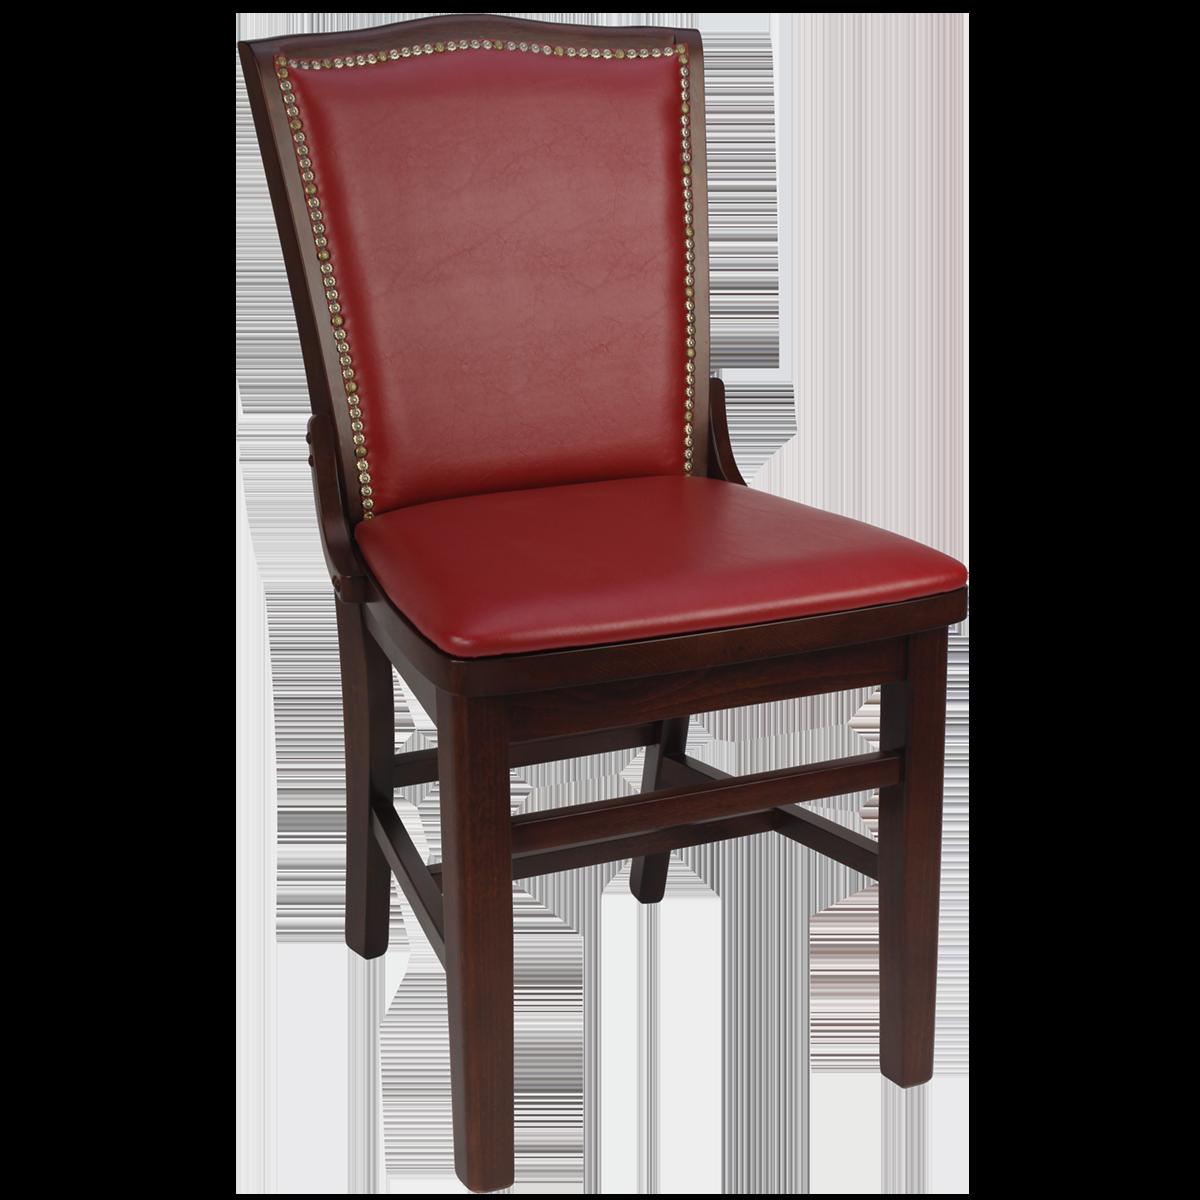 chairs wood schoolhouse chair